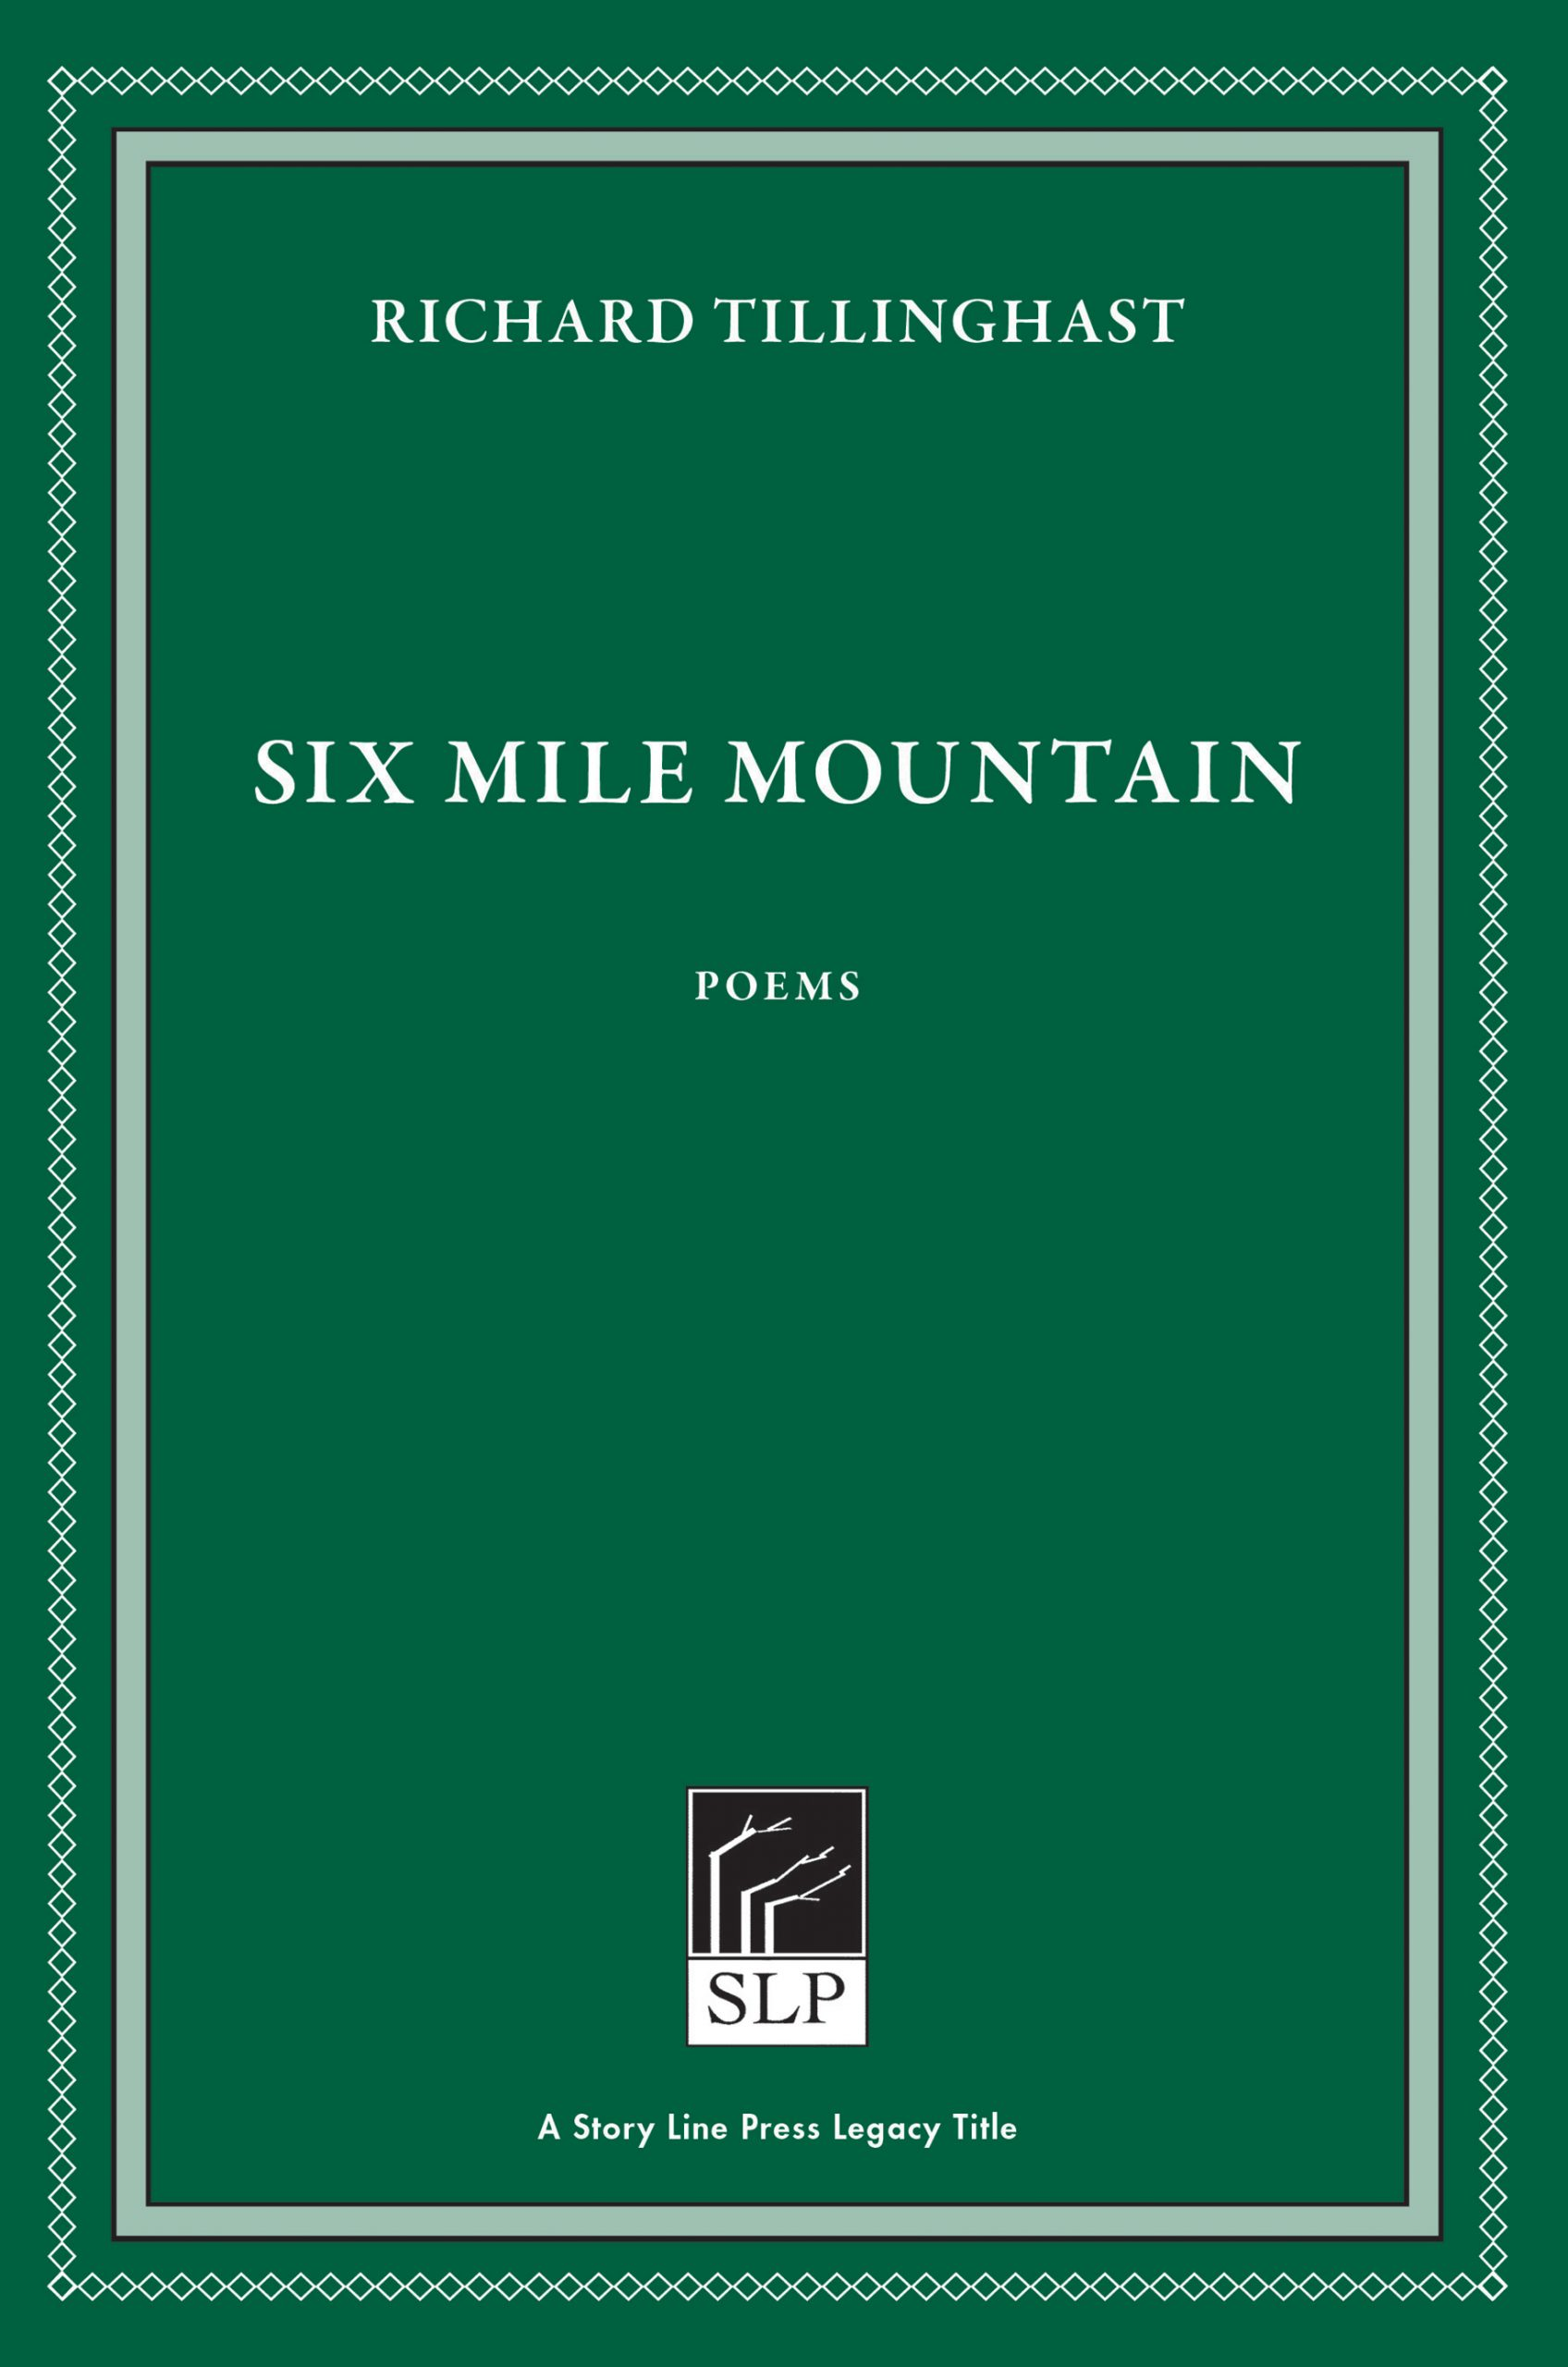 Story Line Press legacy tittle Richard Tillinghast Six Mile Mountain Poems, white script text against emerald green background.